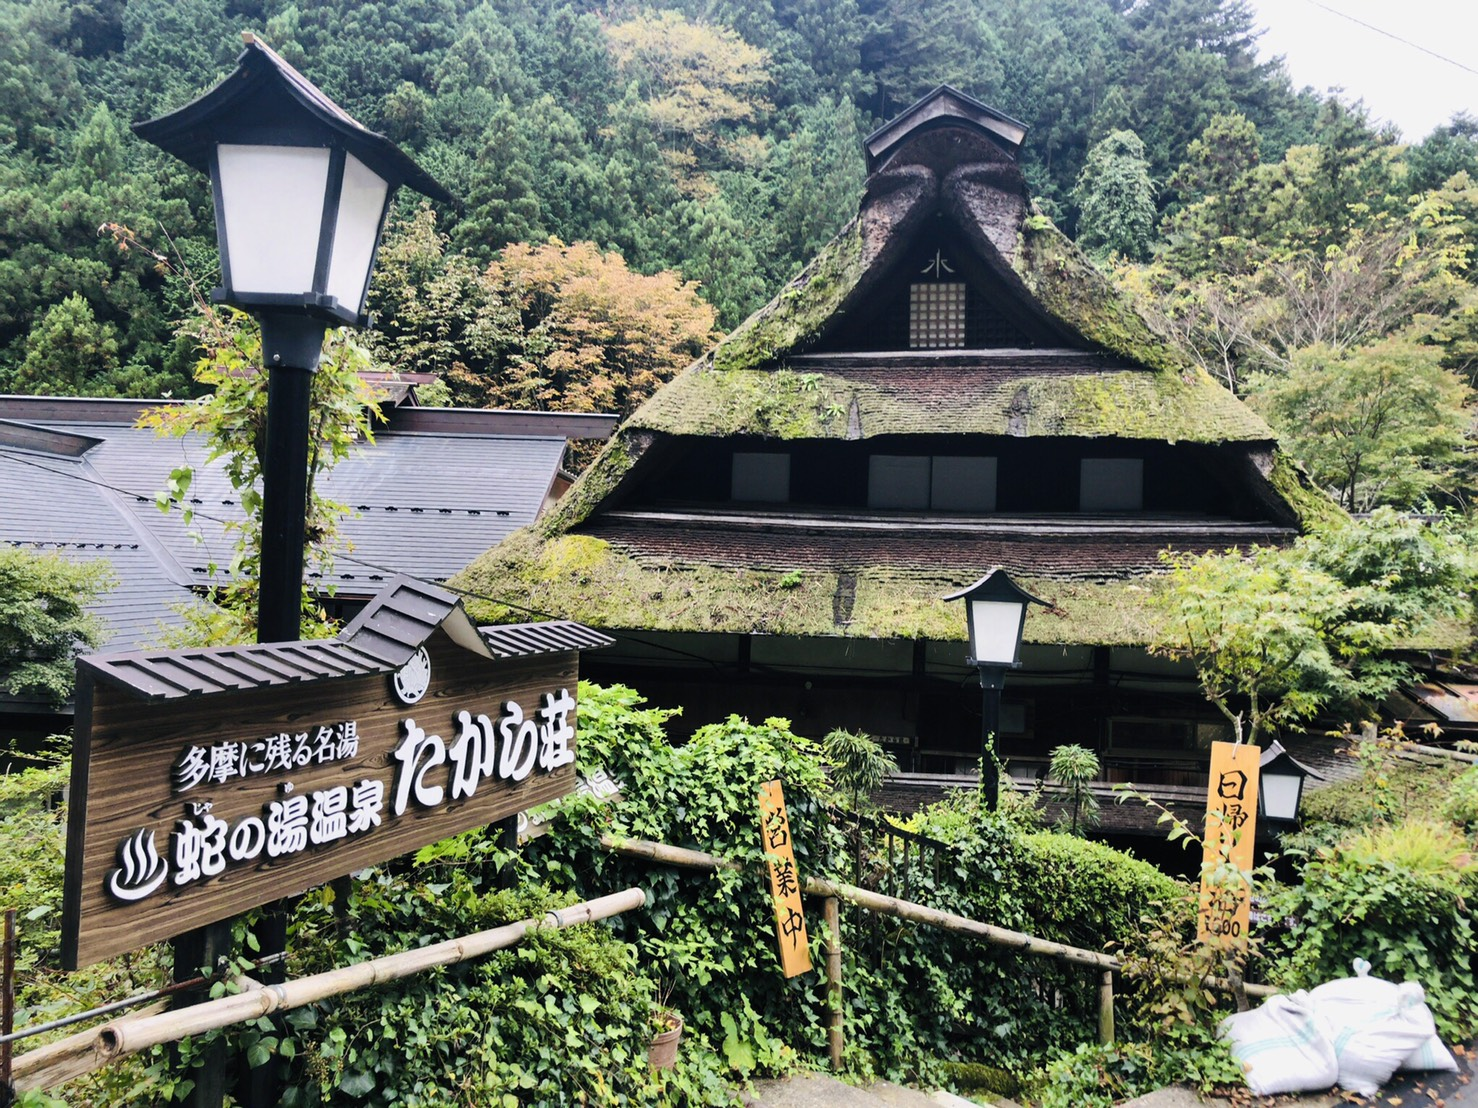 [温泉ハイク・東京]関東百名山 三頭山 & 蛇の湯温泉 2021年8月15日(日)